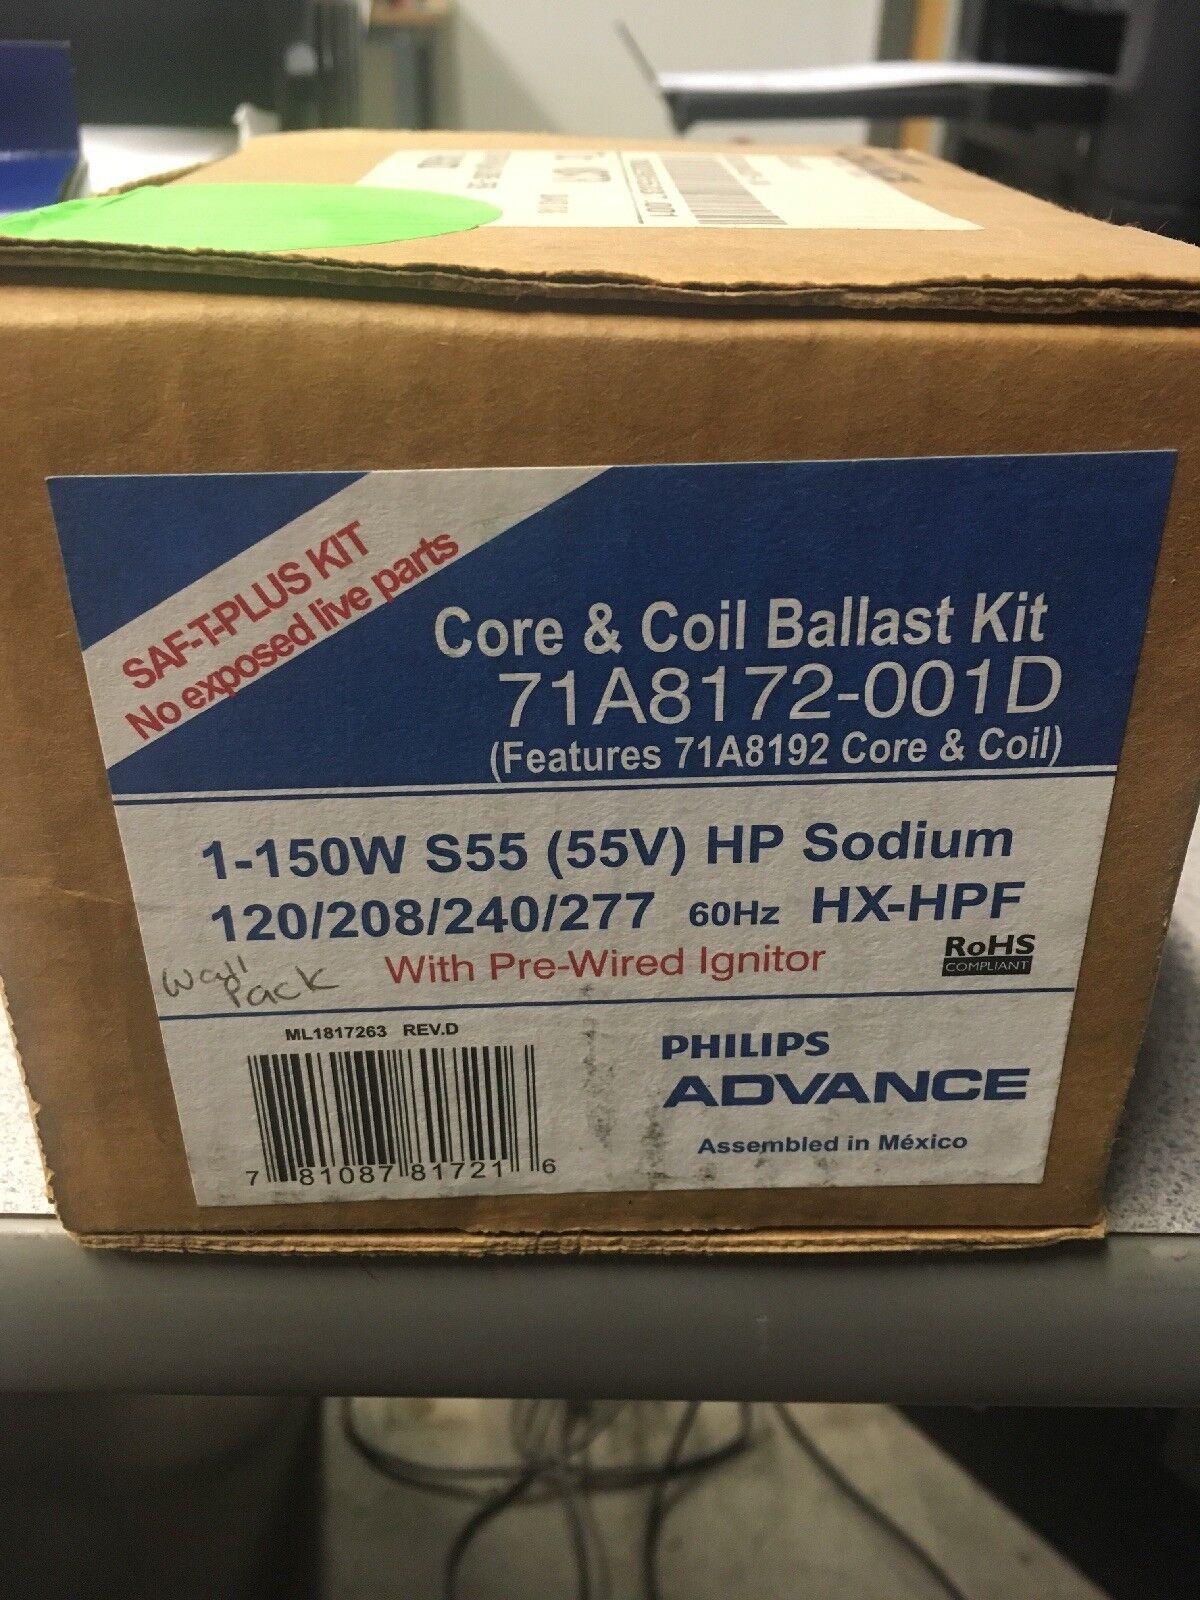 NEW ADVANCE 71A8172-001D BALLAST CORE & COIL KIT 71A8172001D NEW 175W